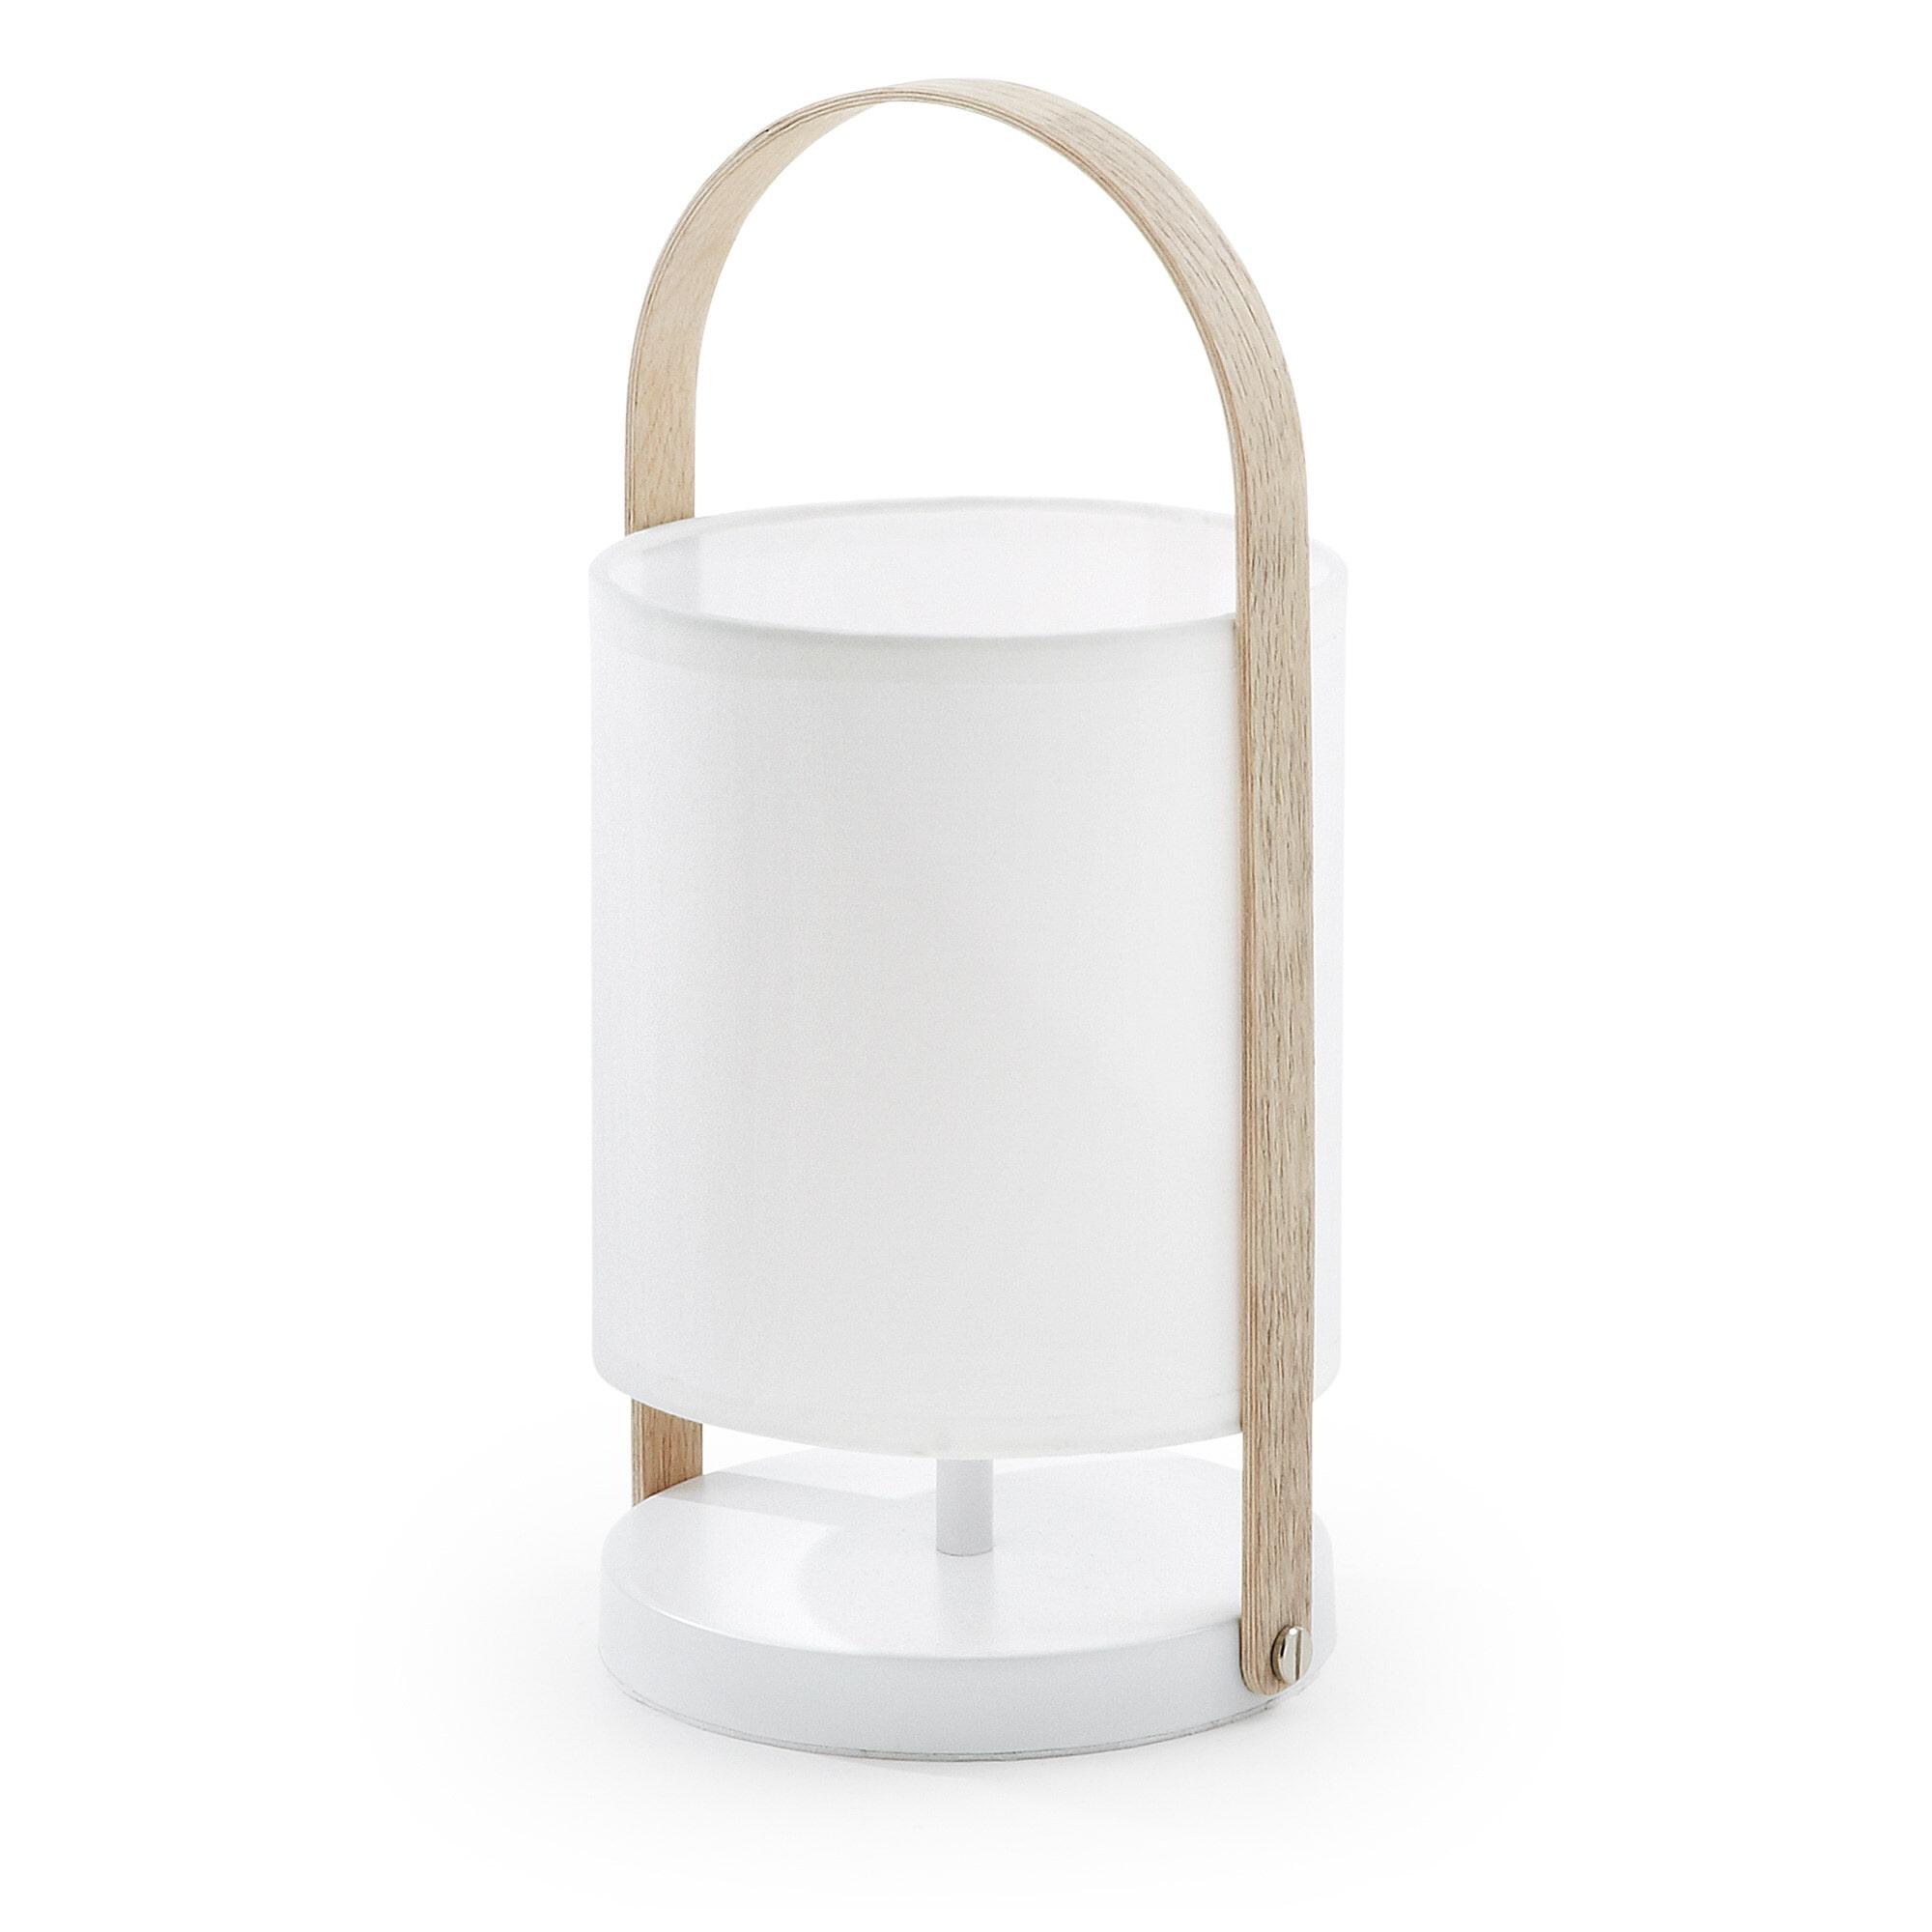 Kave Home Tafellamp 'Zayma' kleur wit